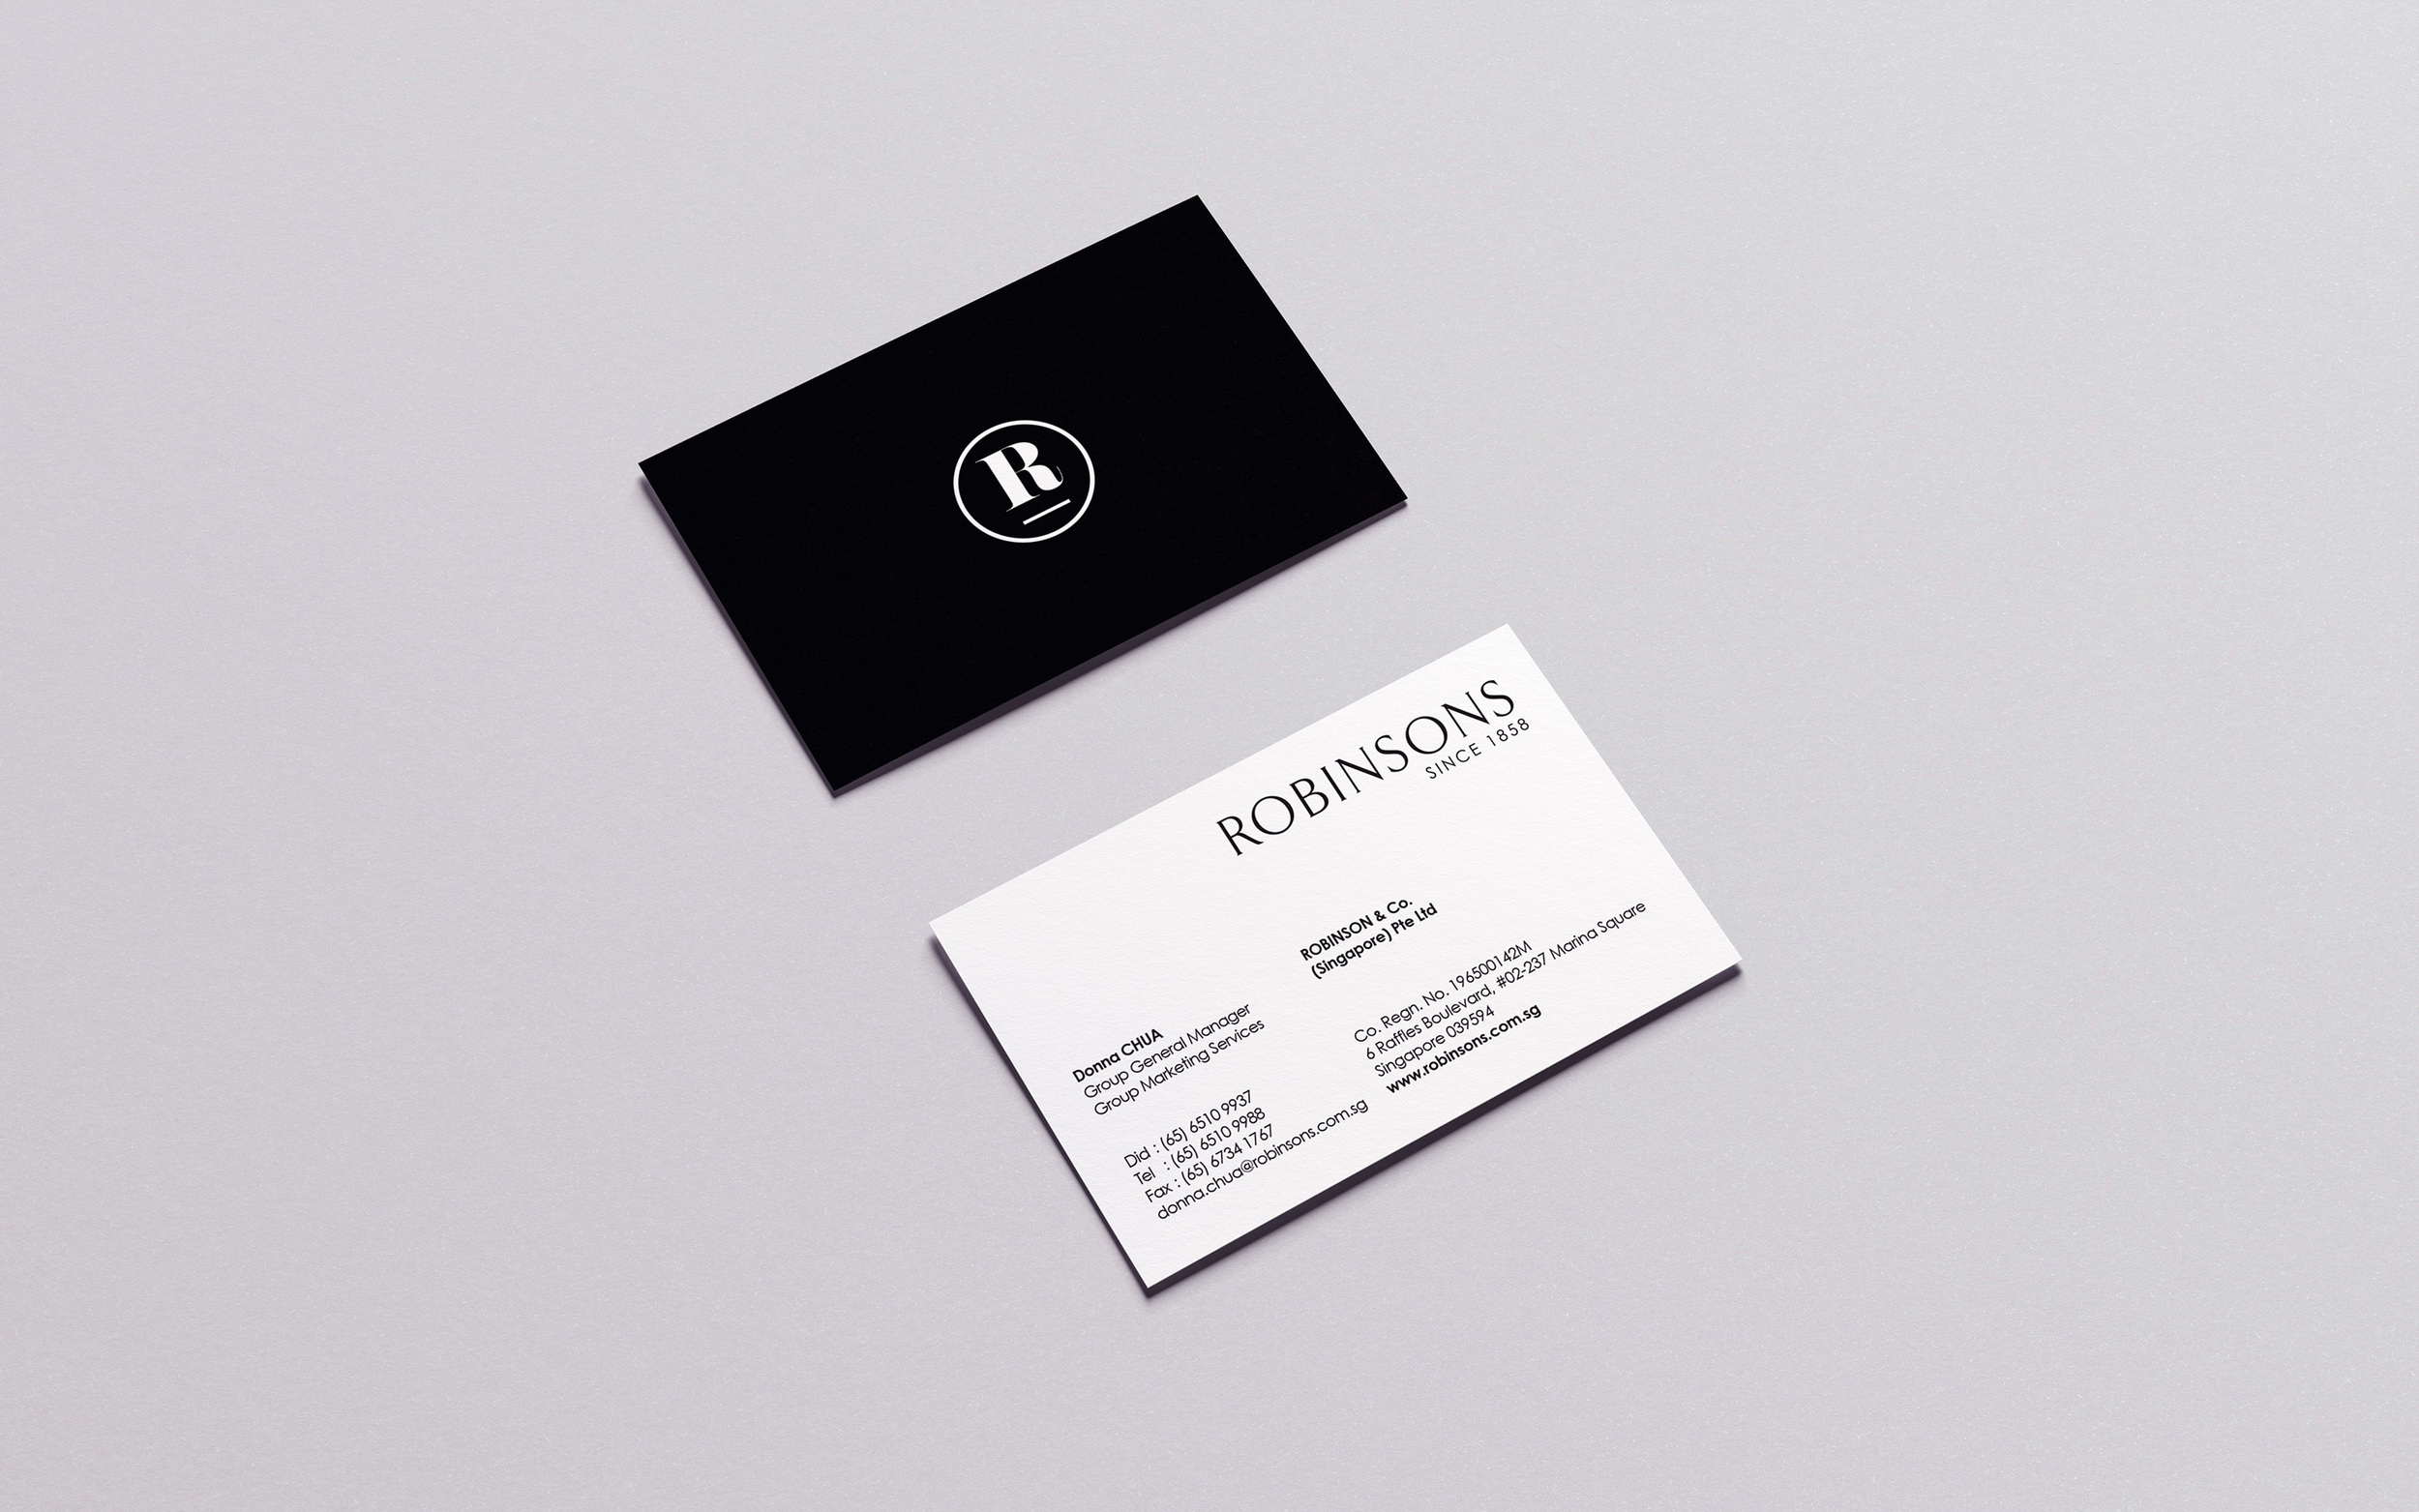 robinsons-design-childer-07.jpg